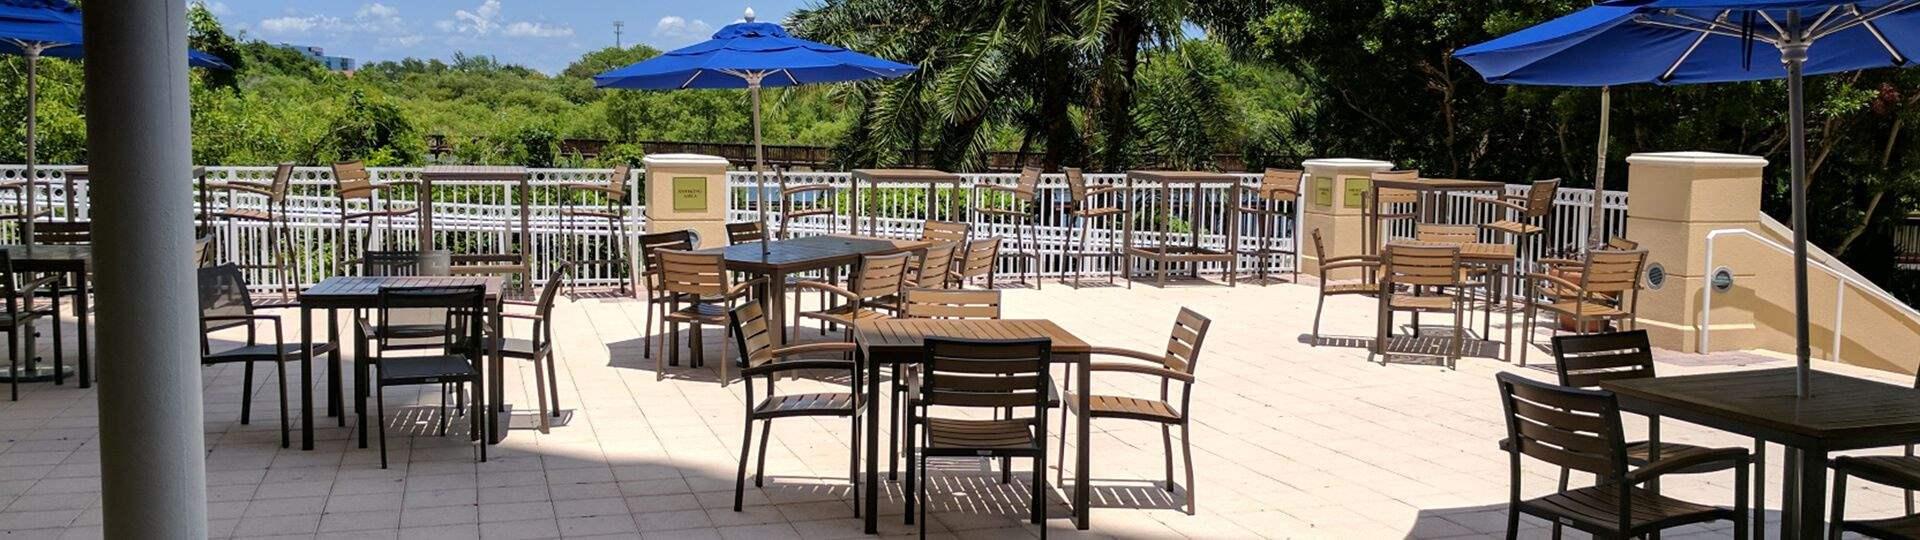 Luna Restaurant & Lounge, Florida - Site Map